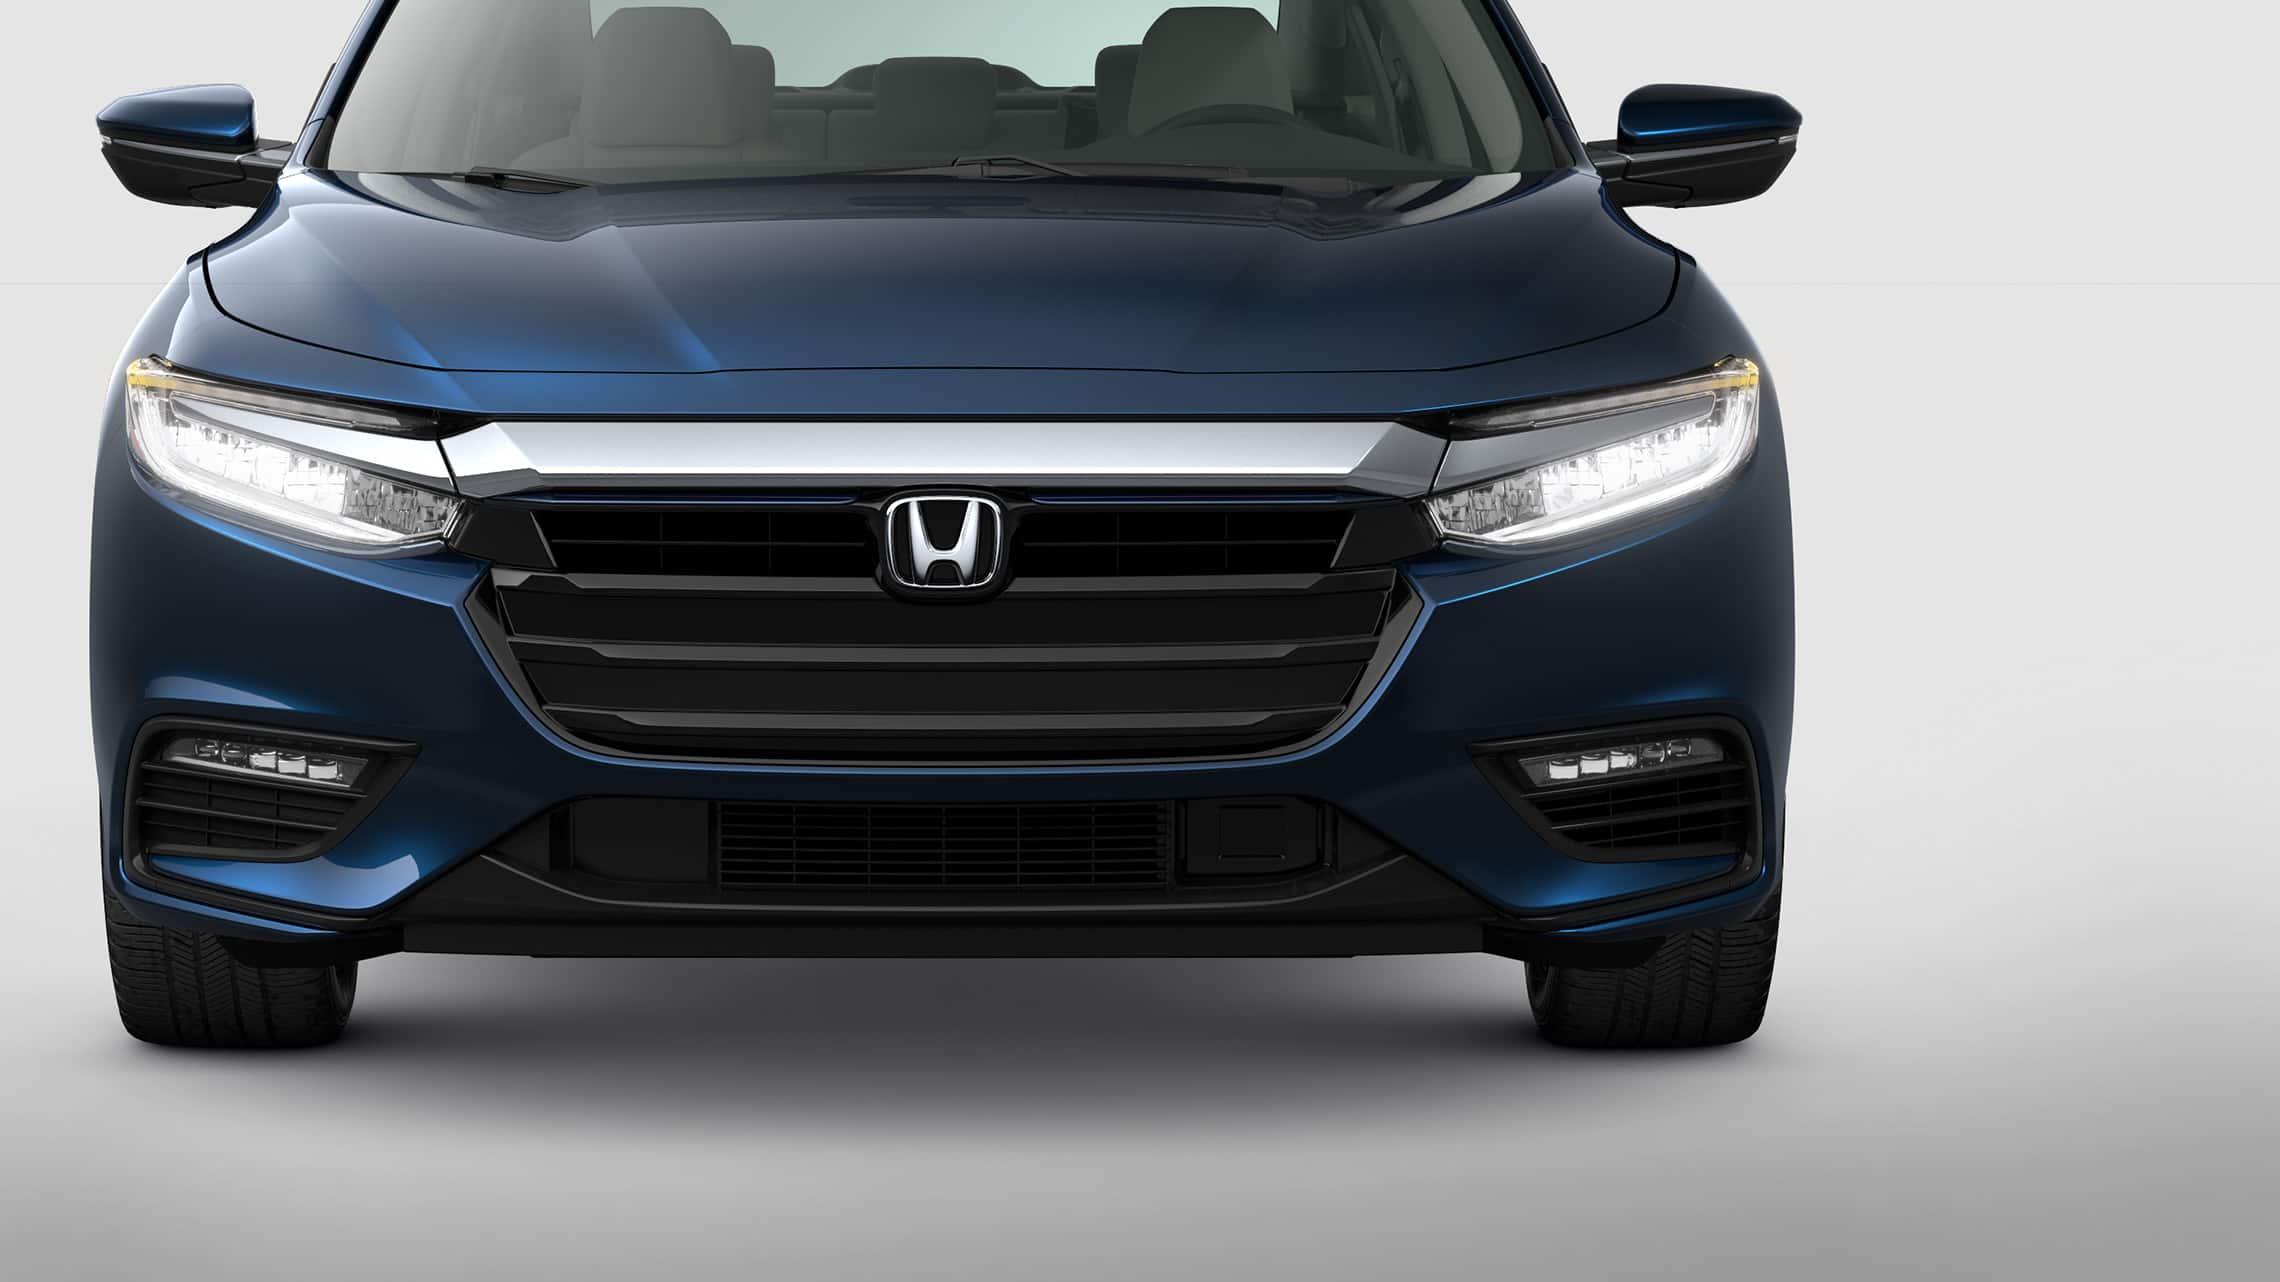 Vista frontal del Honda Insight2021 en Cosmic Blue Metallic.